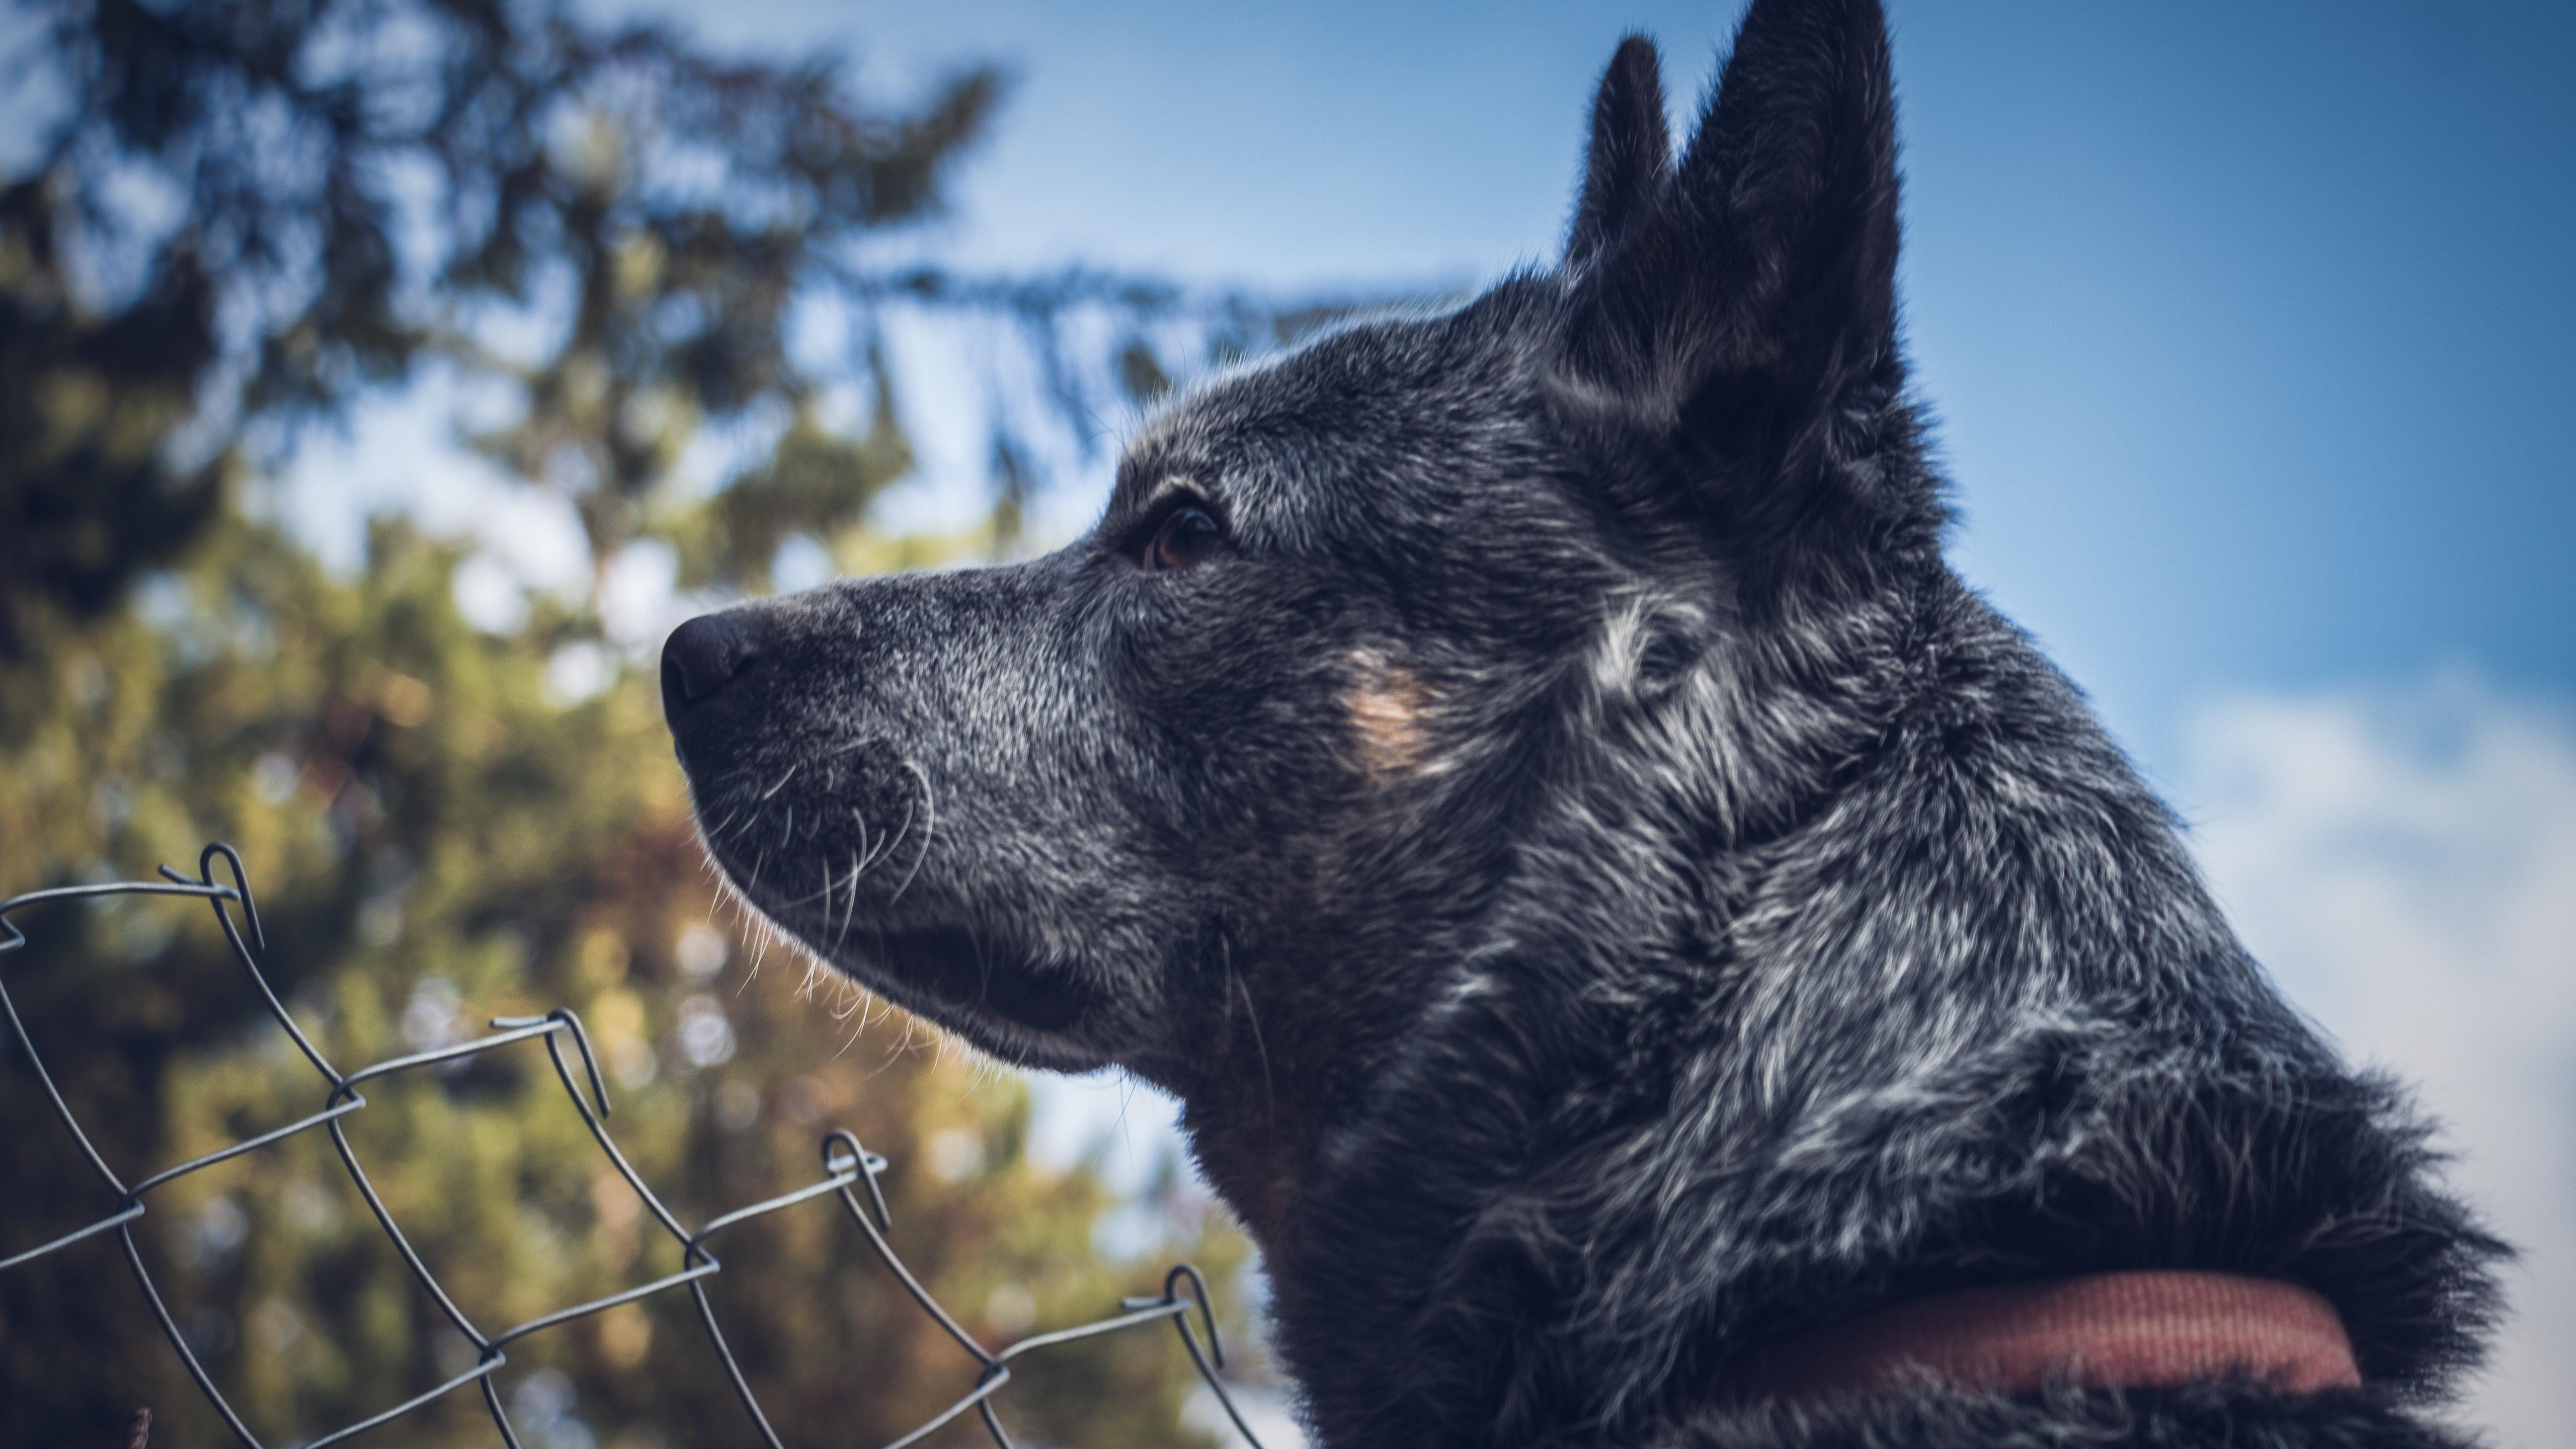 Portrait of a dog photo